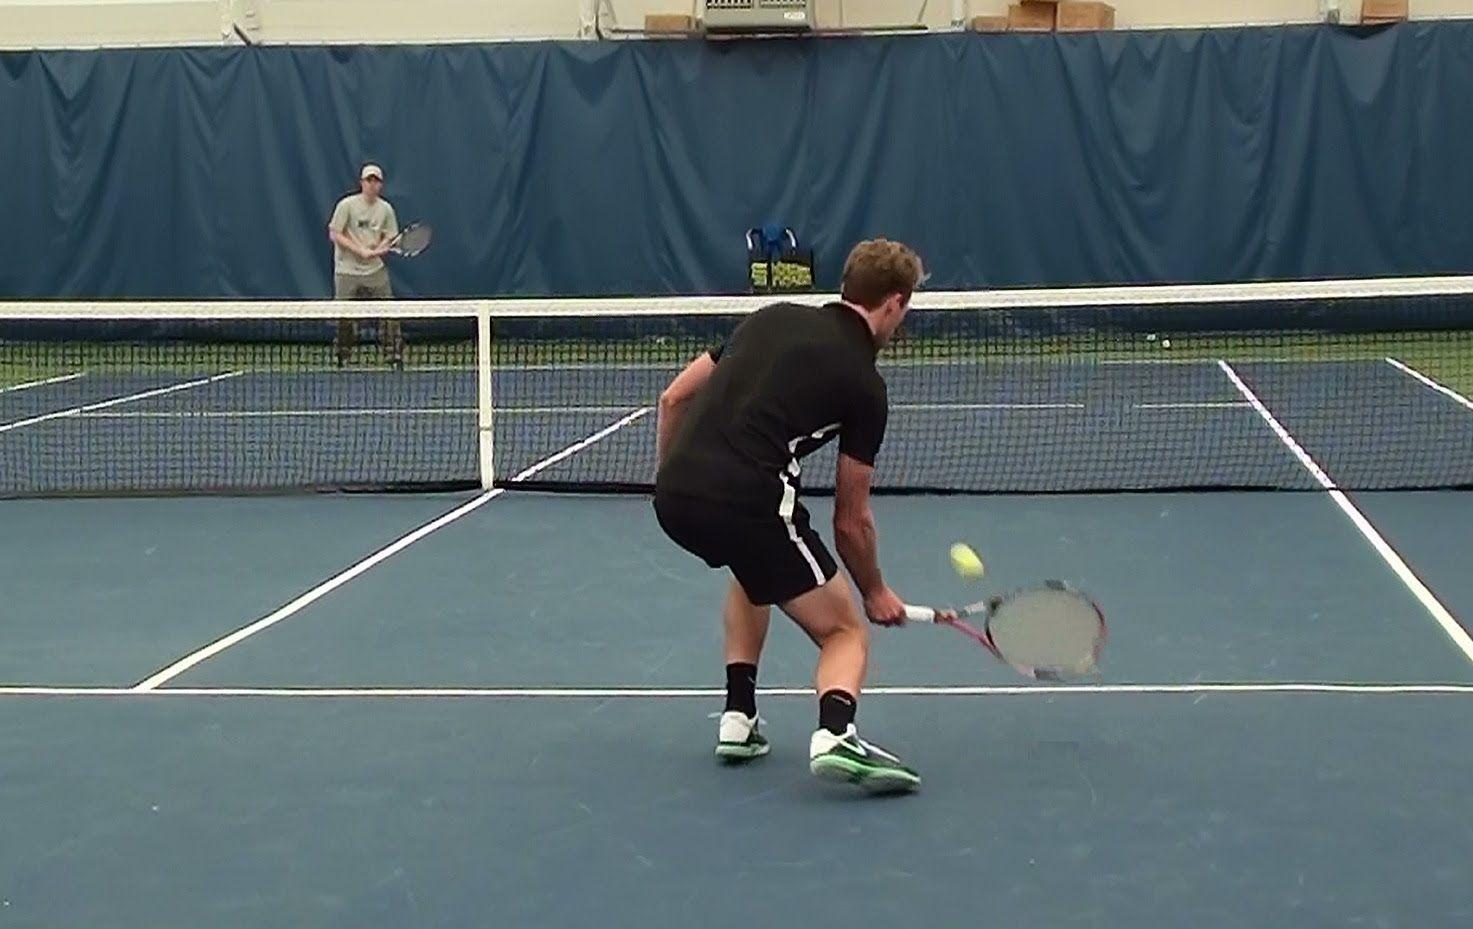 Professional Purposeful Practice Doubles Drills Tennis Tennis Doubles Tennis Tips